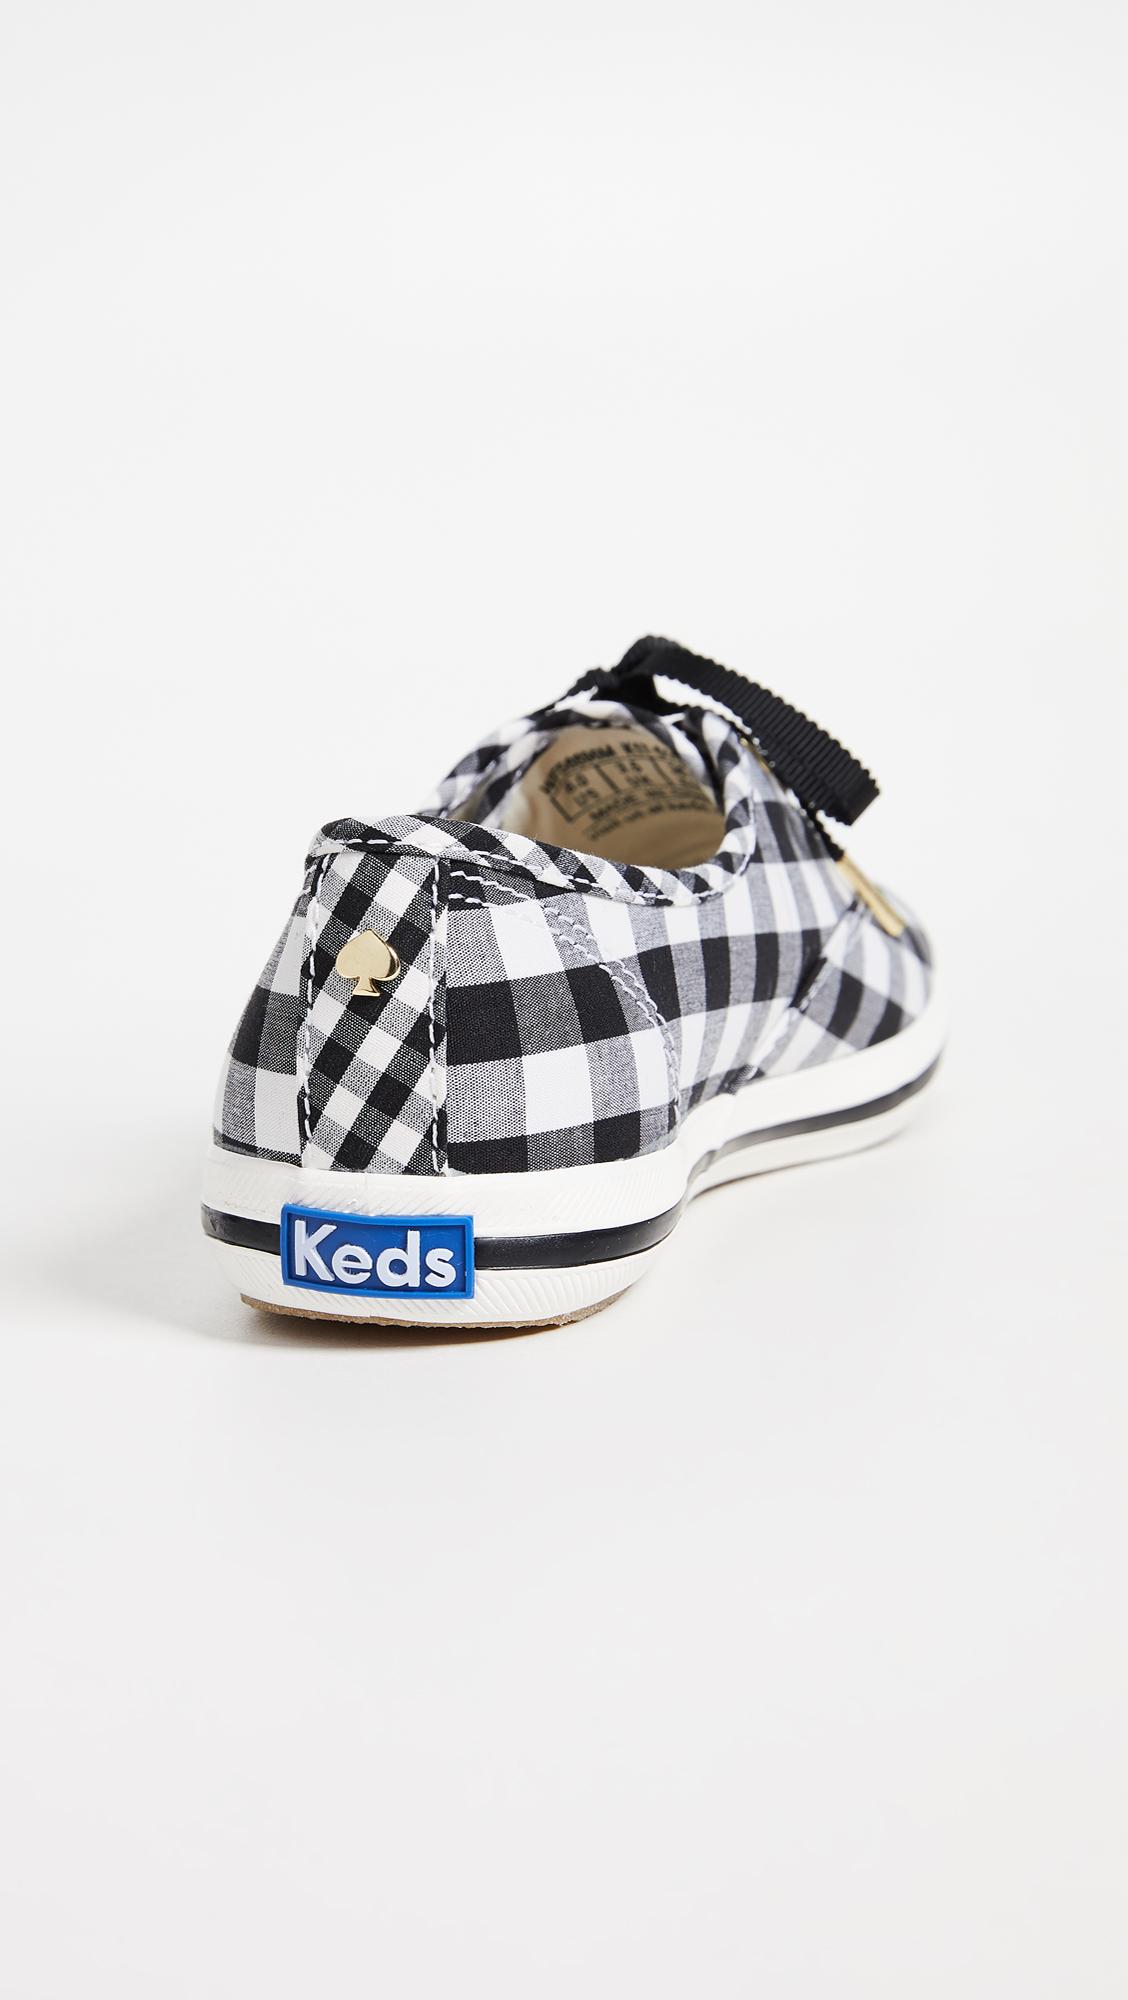 e4dda9226710 Keds x Kate Spade New York Gingham Sneakers